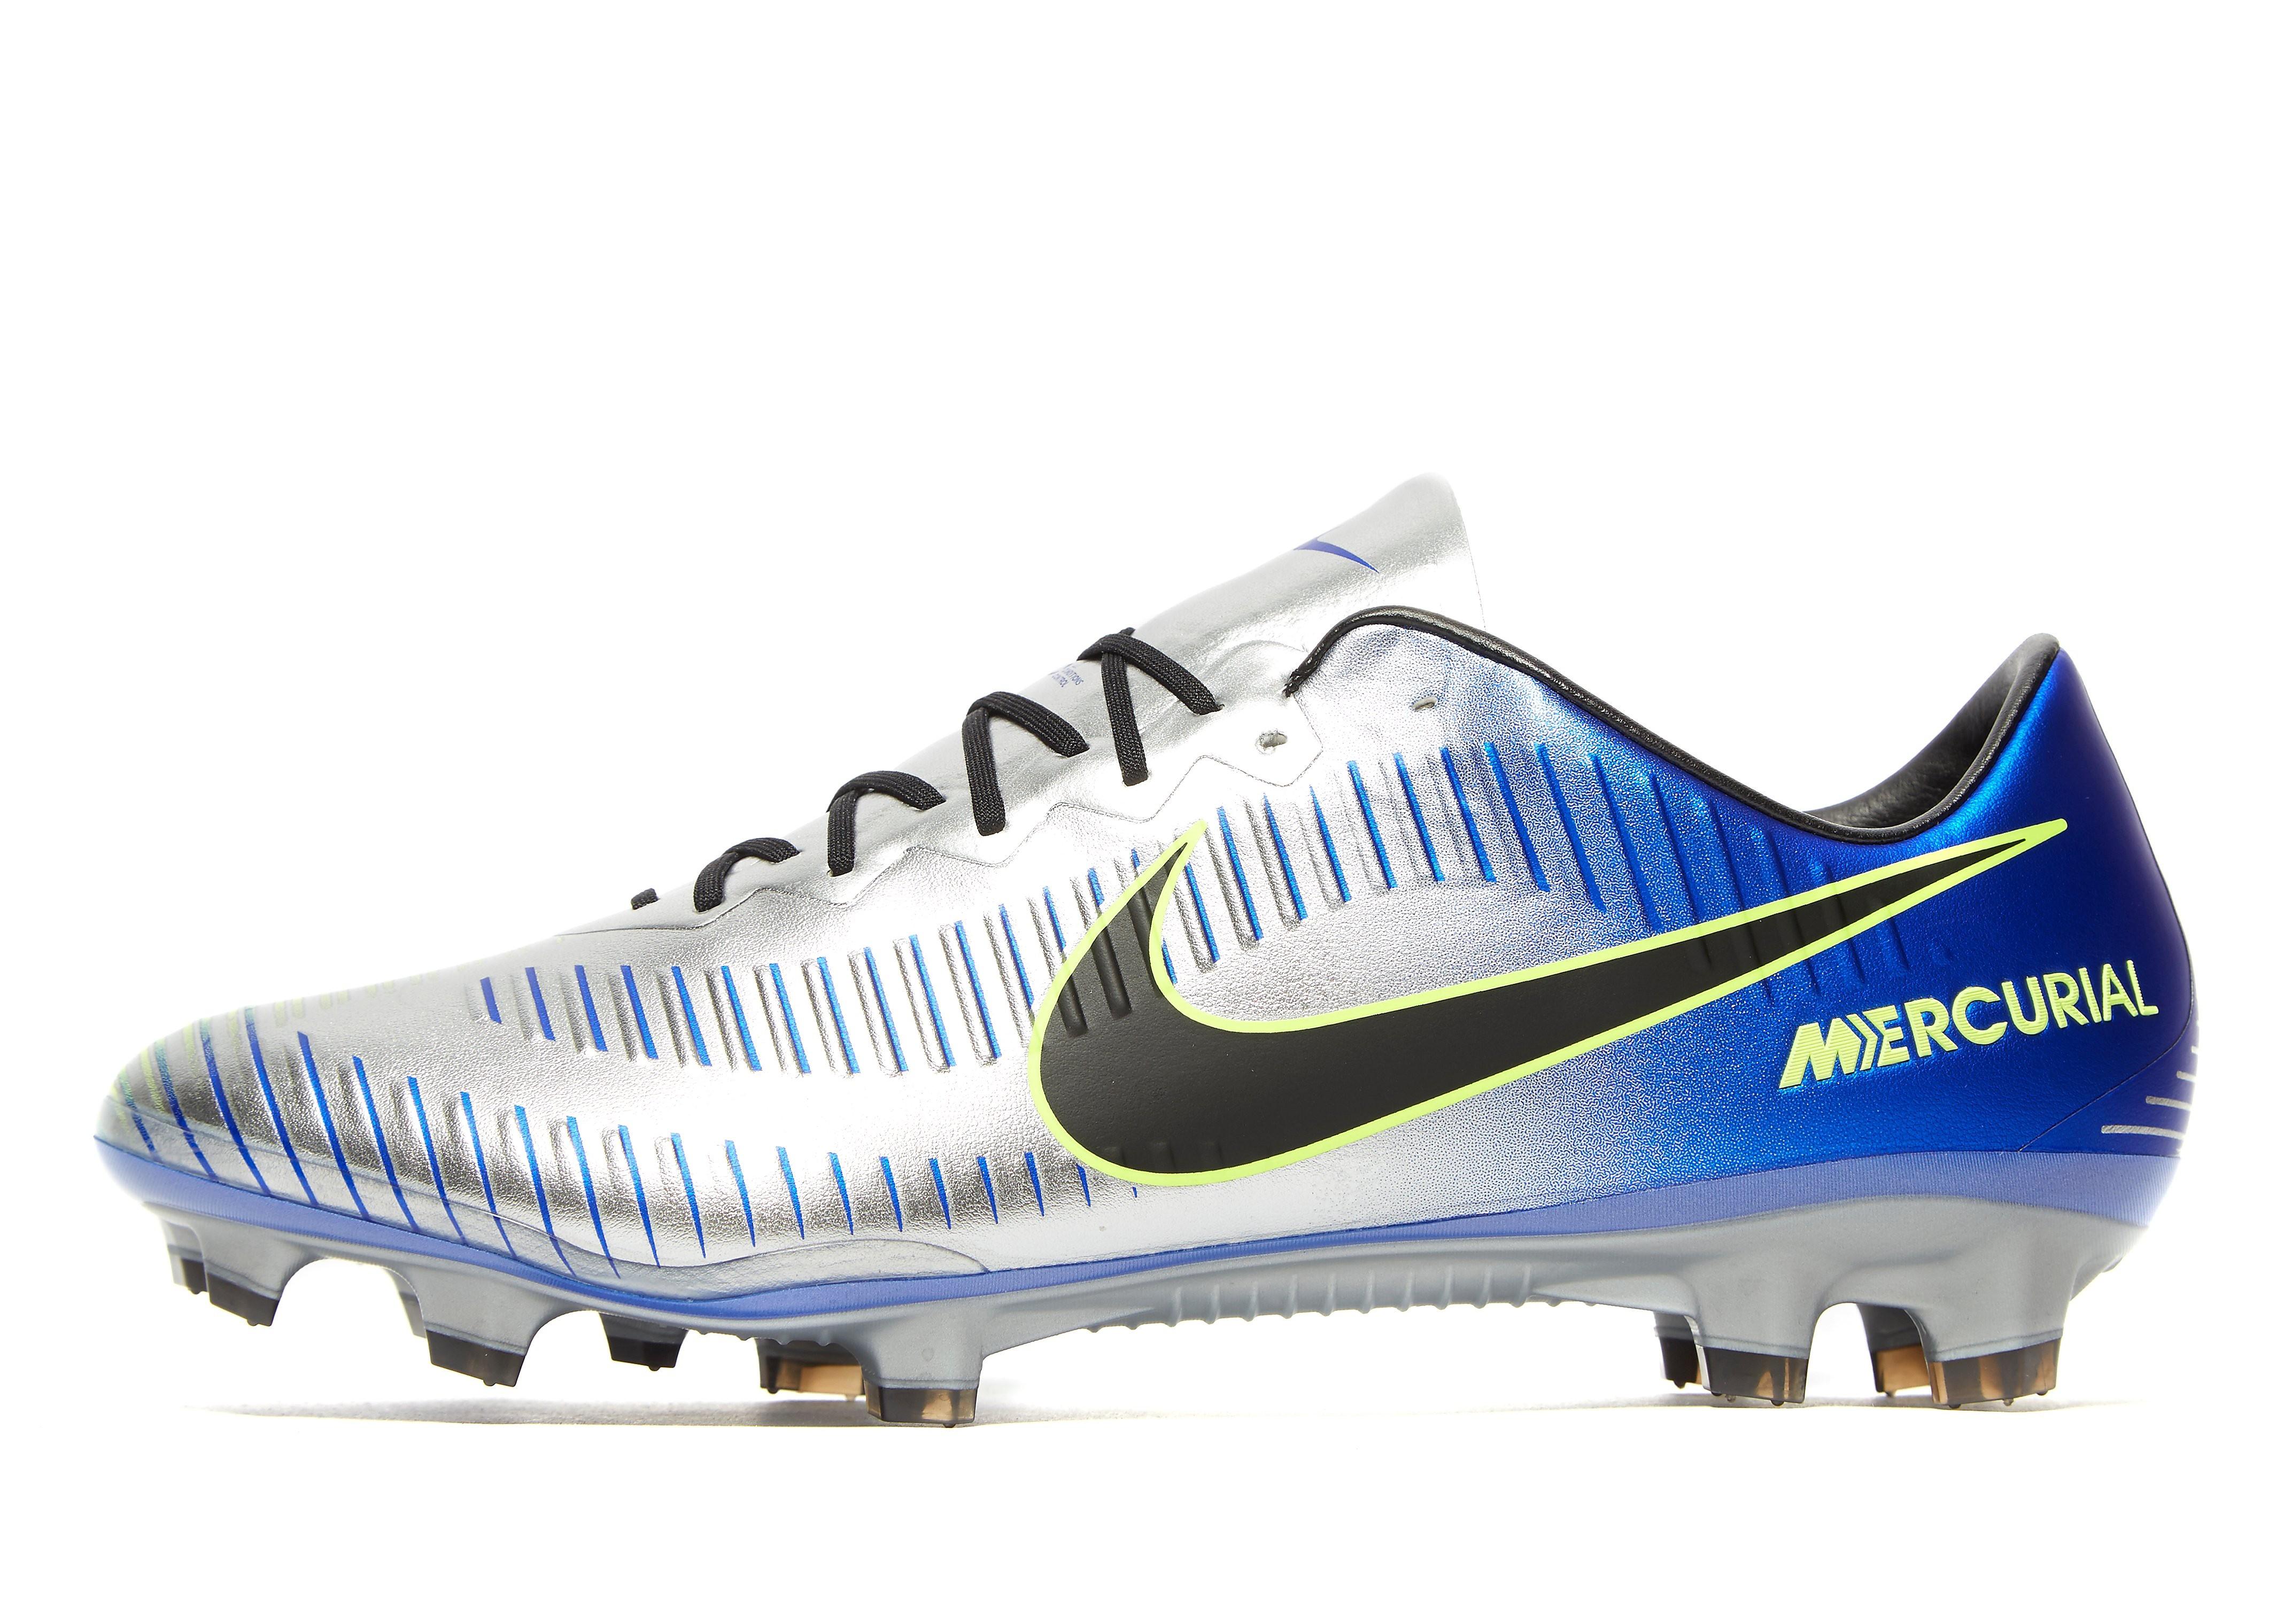 Nike Neymar Jr Mercurial Vapor FG